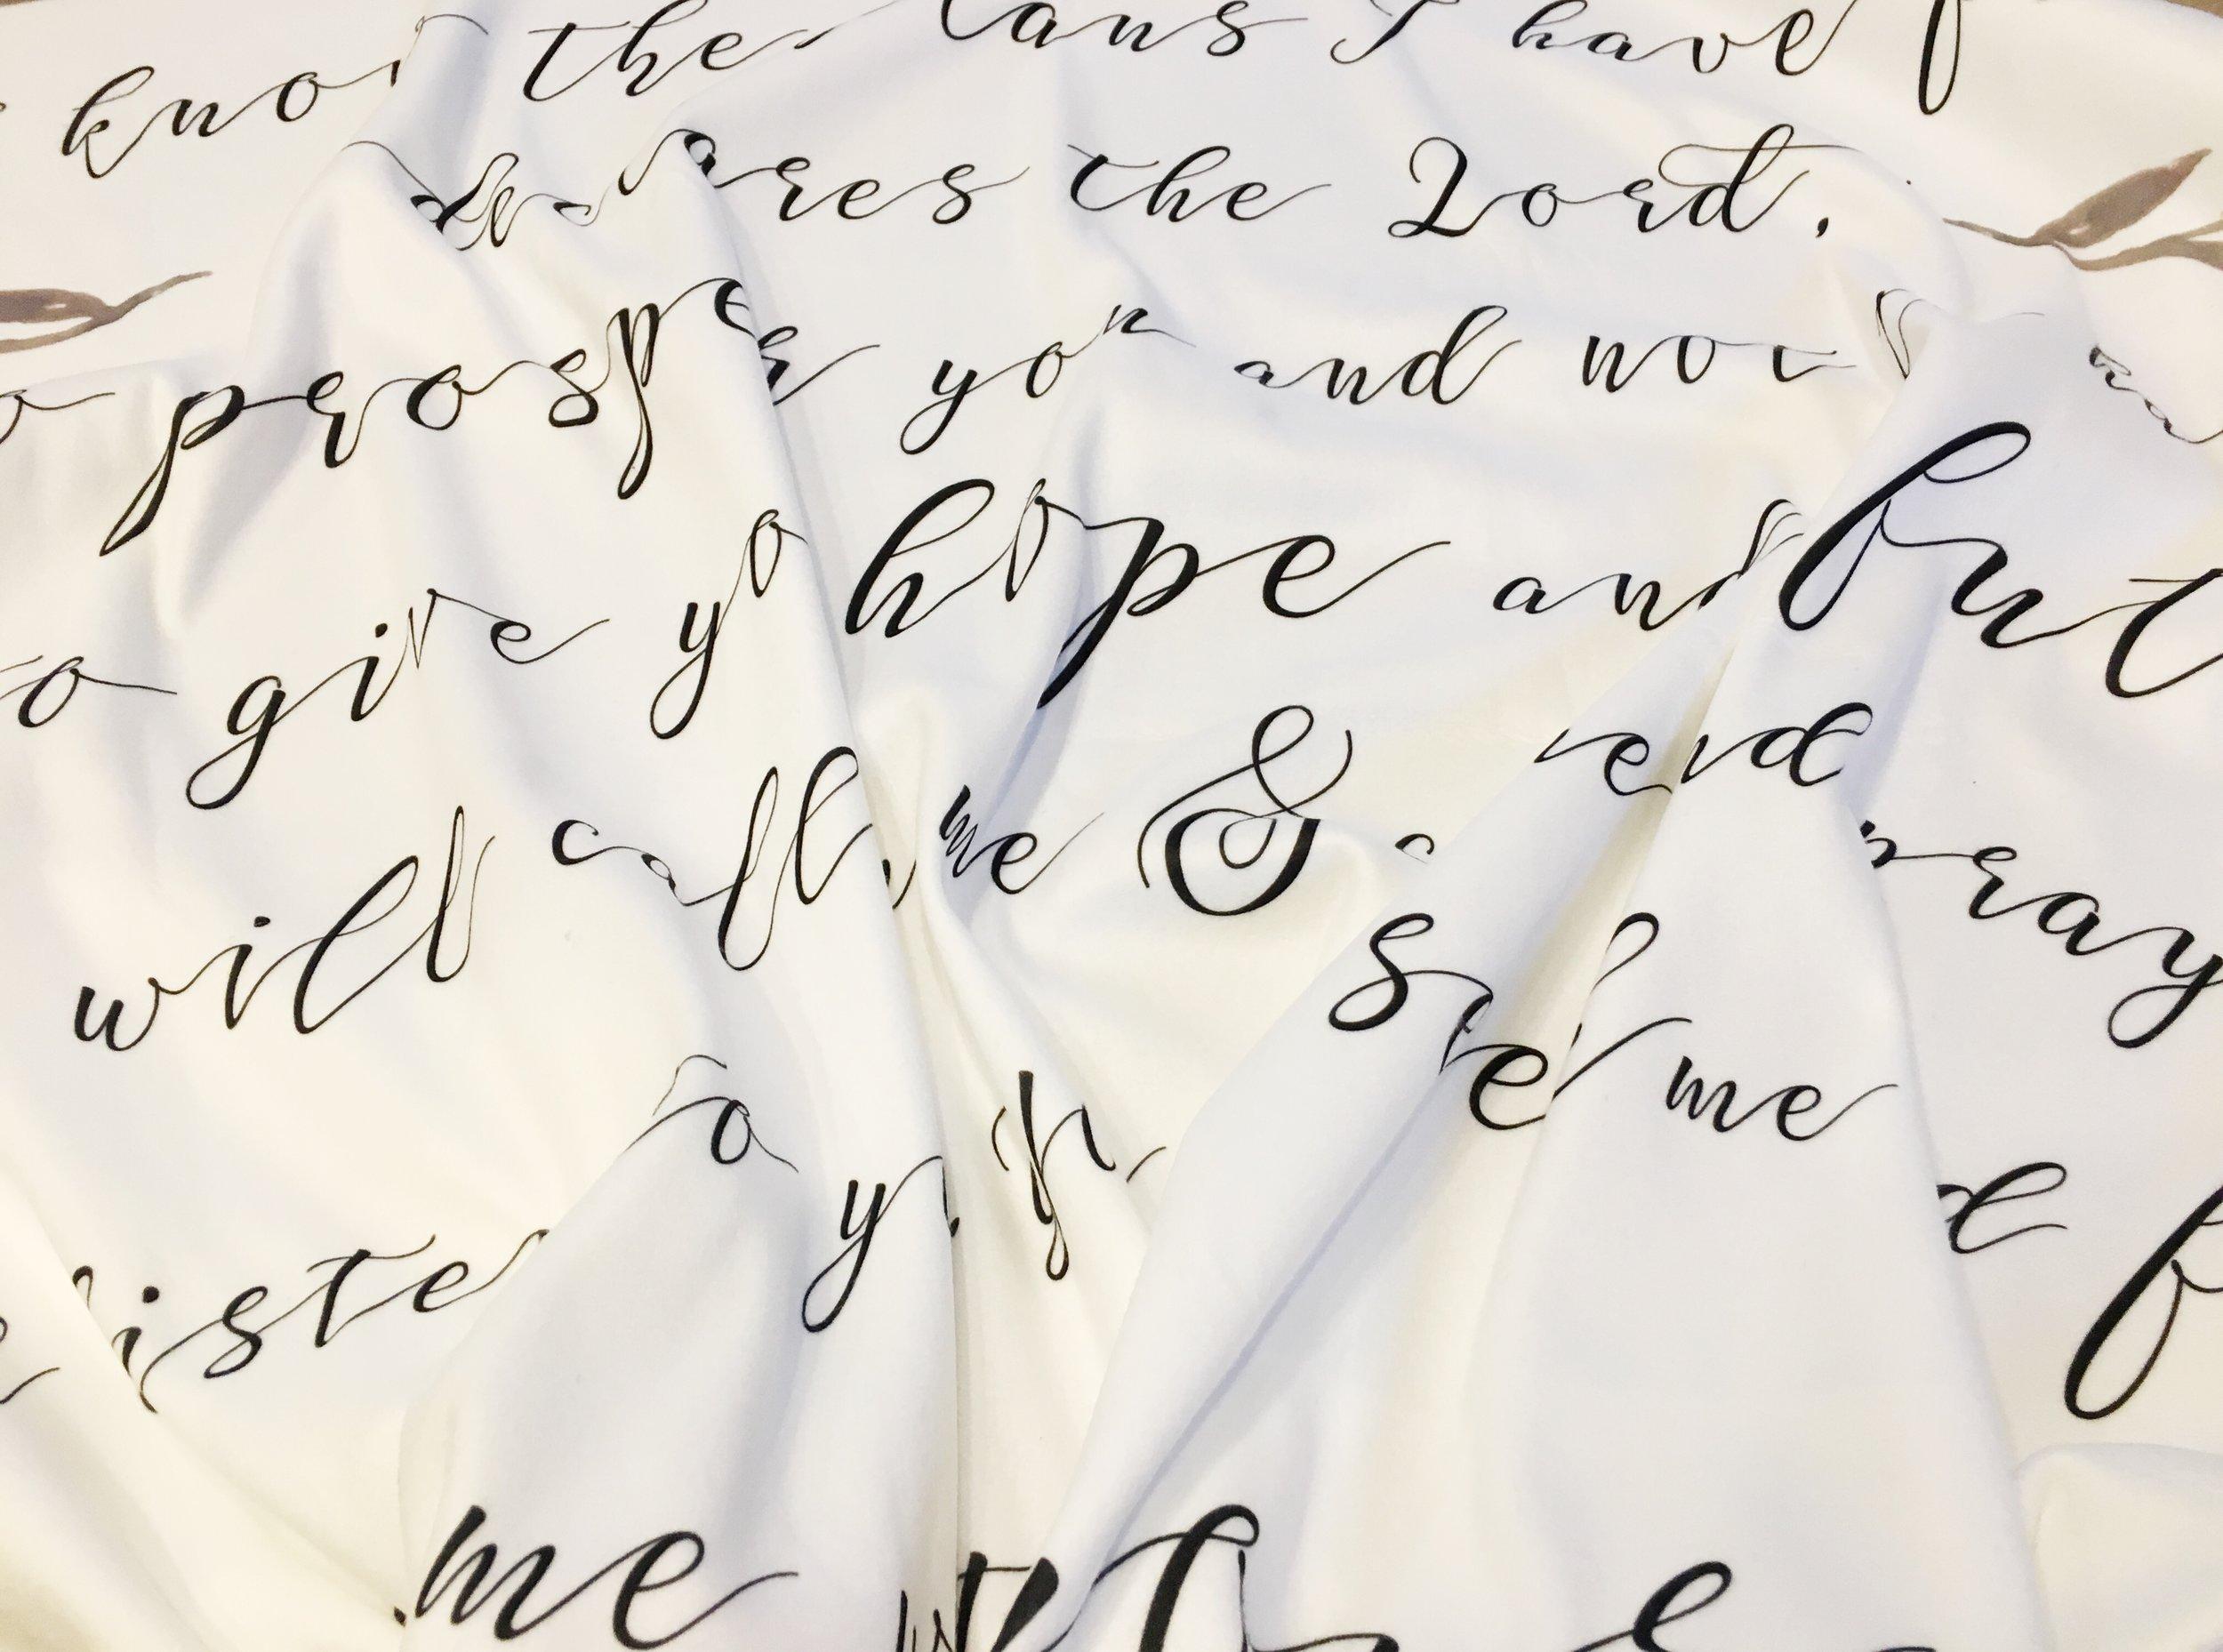 Central PA, Baby Blanket, Hand lettered, JesSmith Designs, Invitations, custom-01-25 16.59.07.jpg